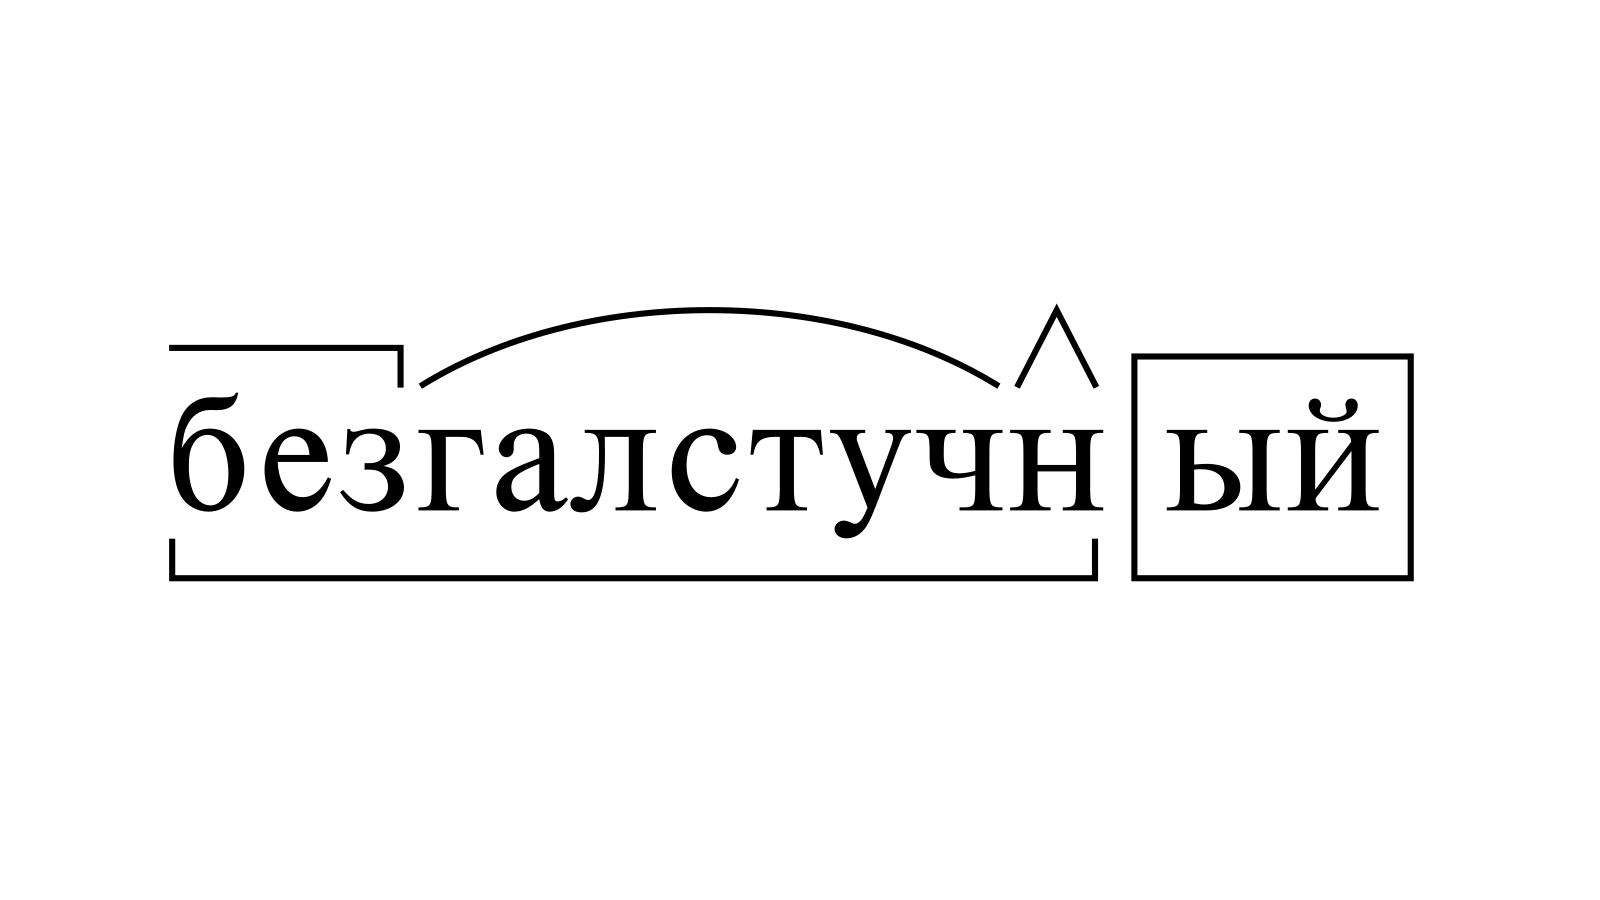 Разбор слова «безгалстучный» по составу